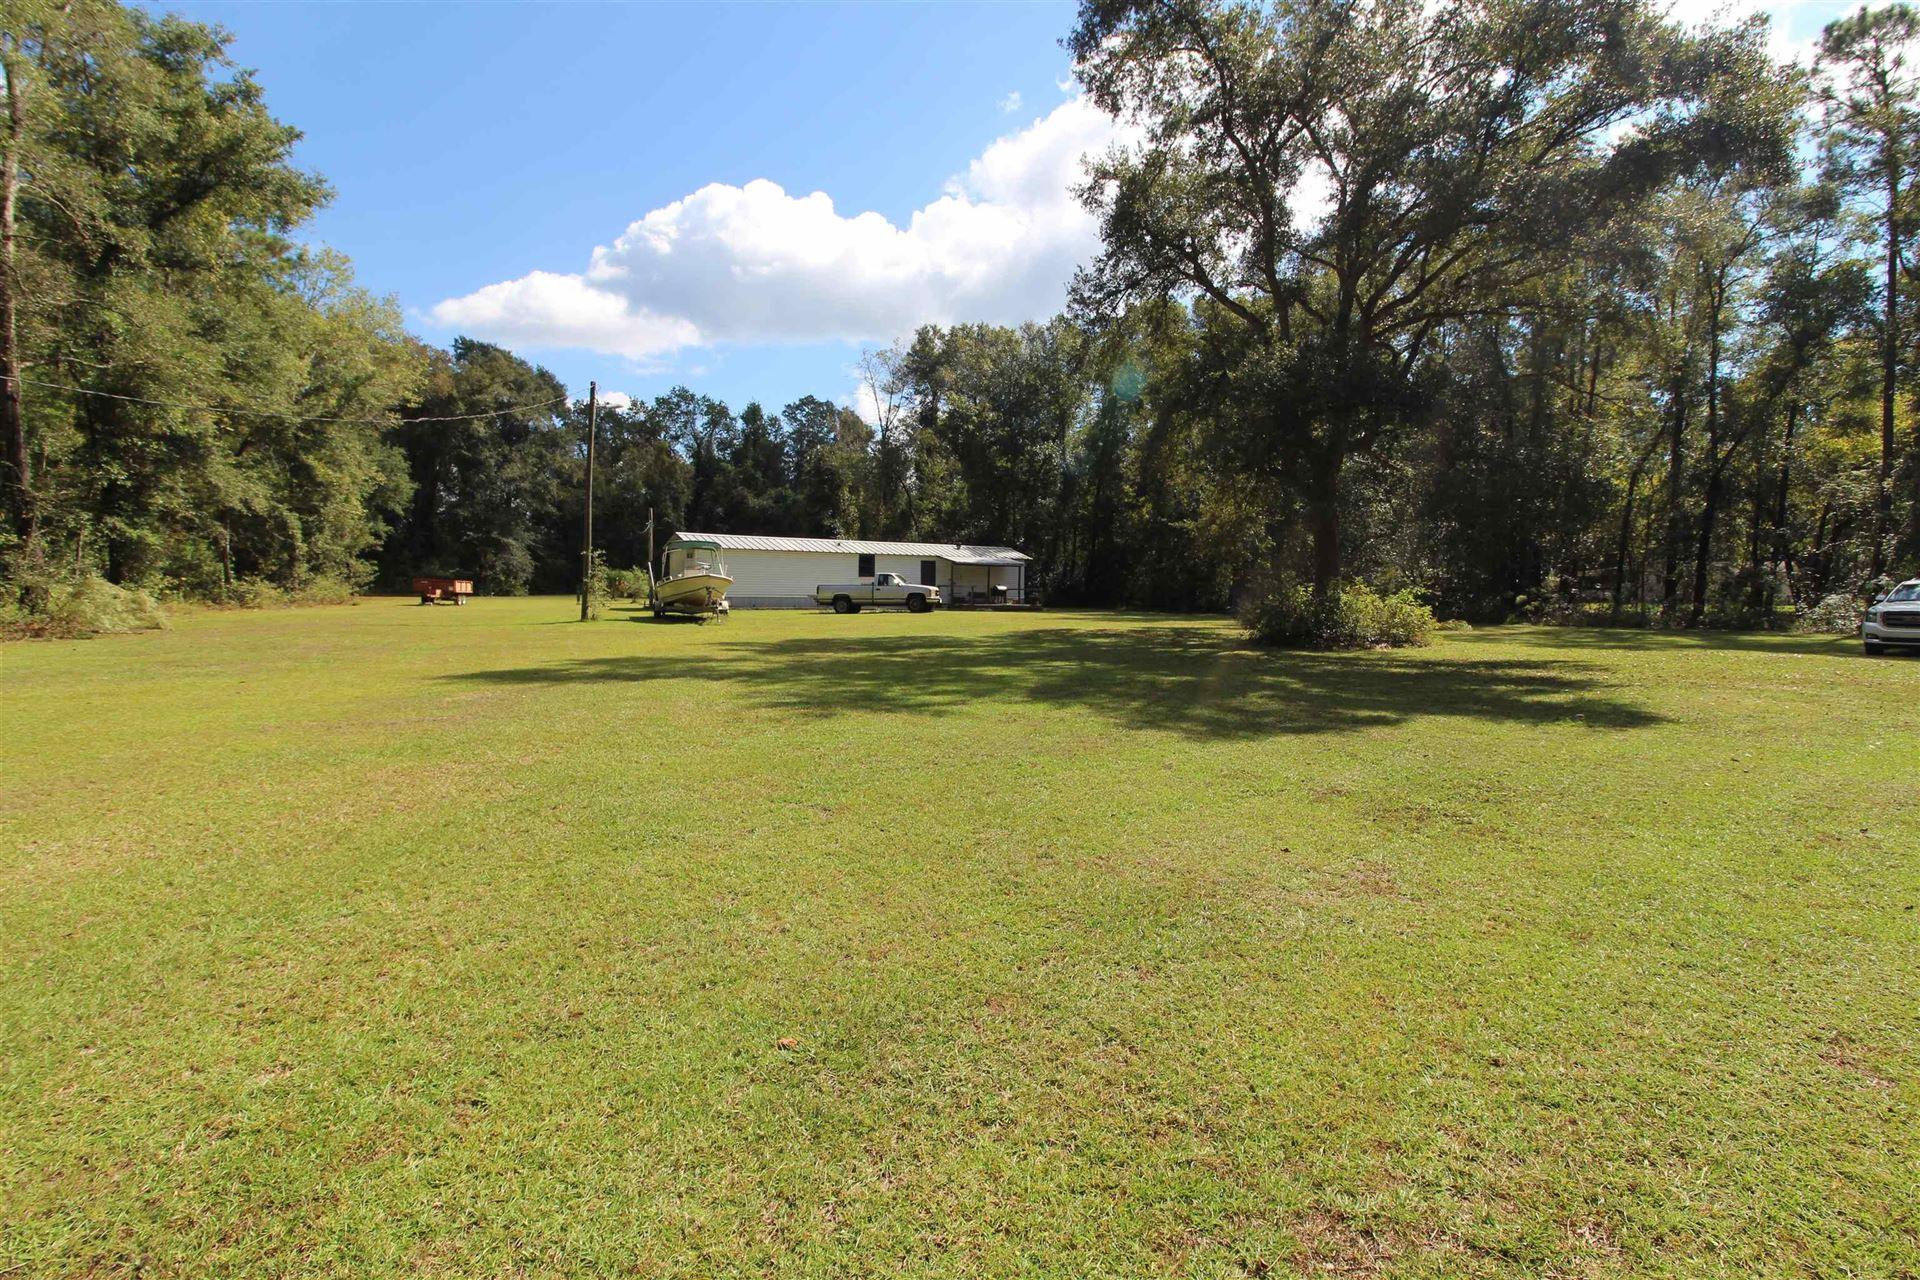 93 Rutland Road, Crawfordville, FL 32327 - MLS#: 338499